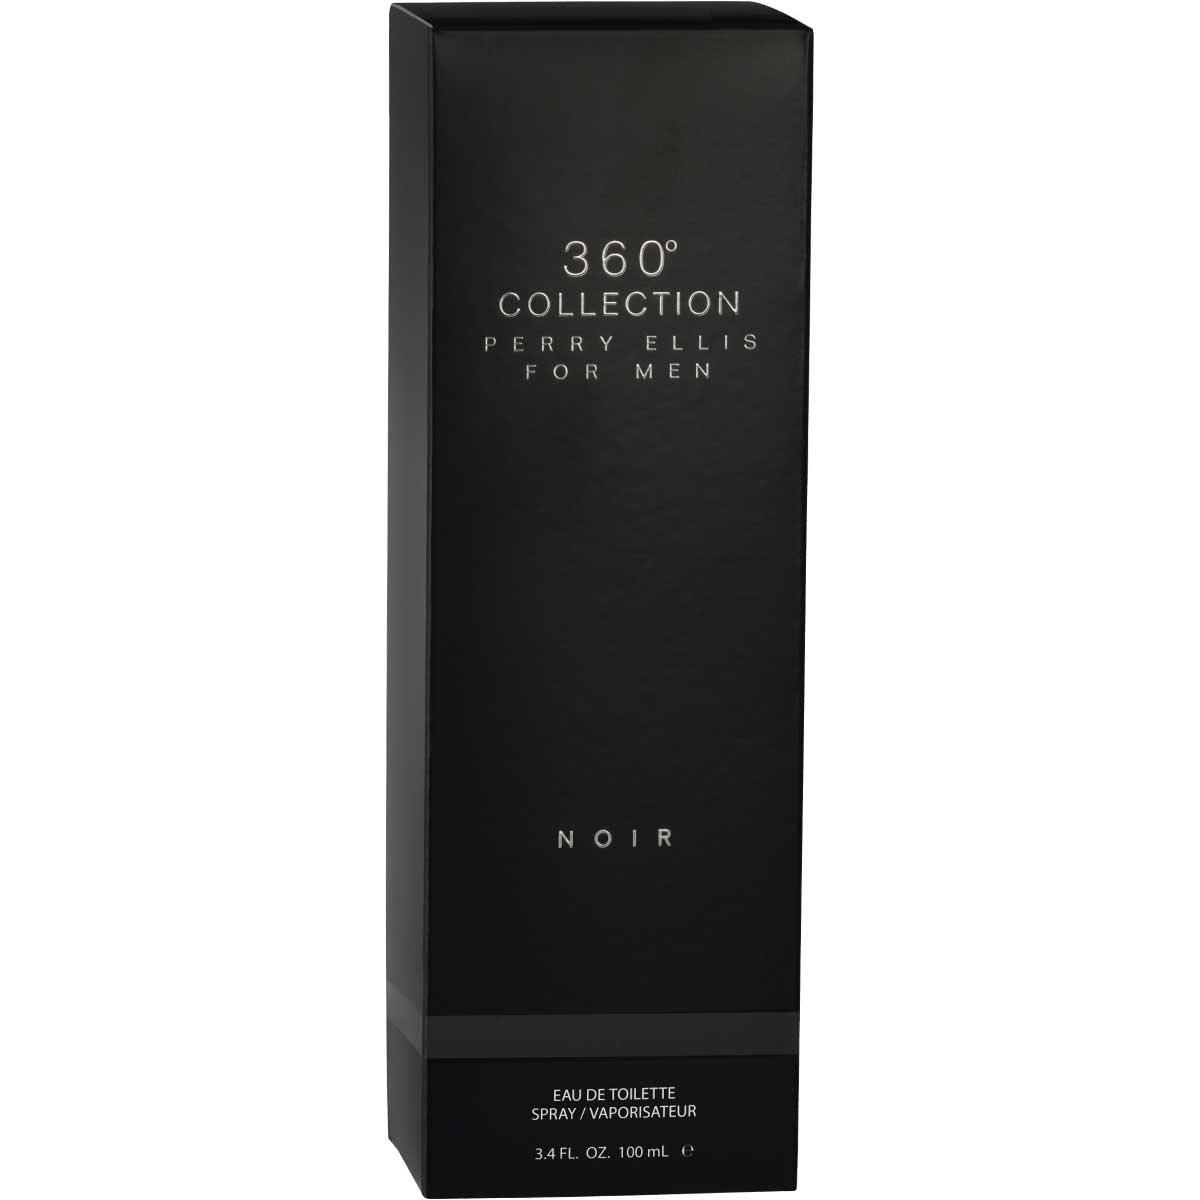 360° Collection Noir